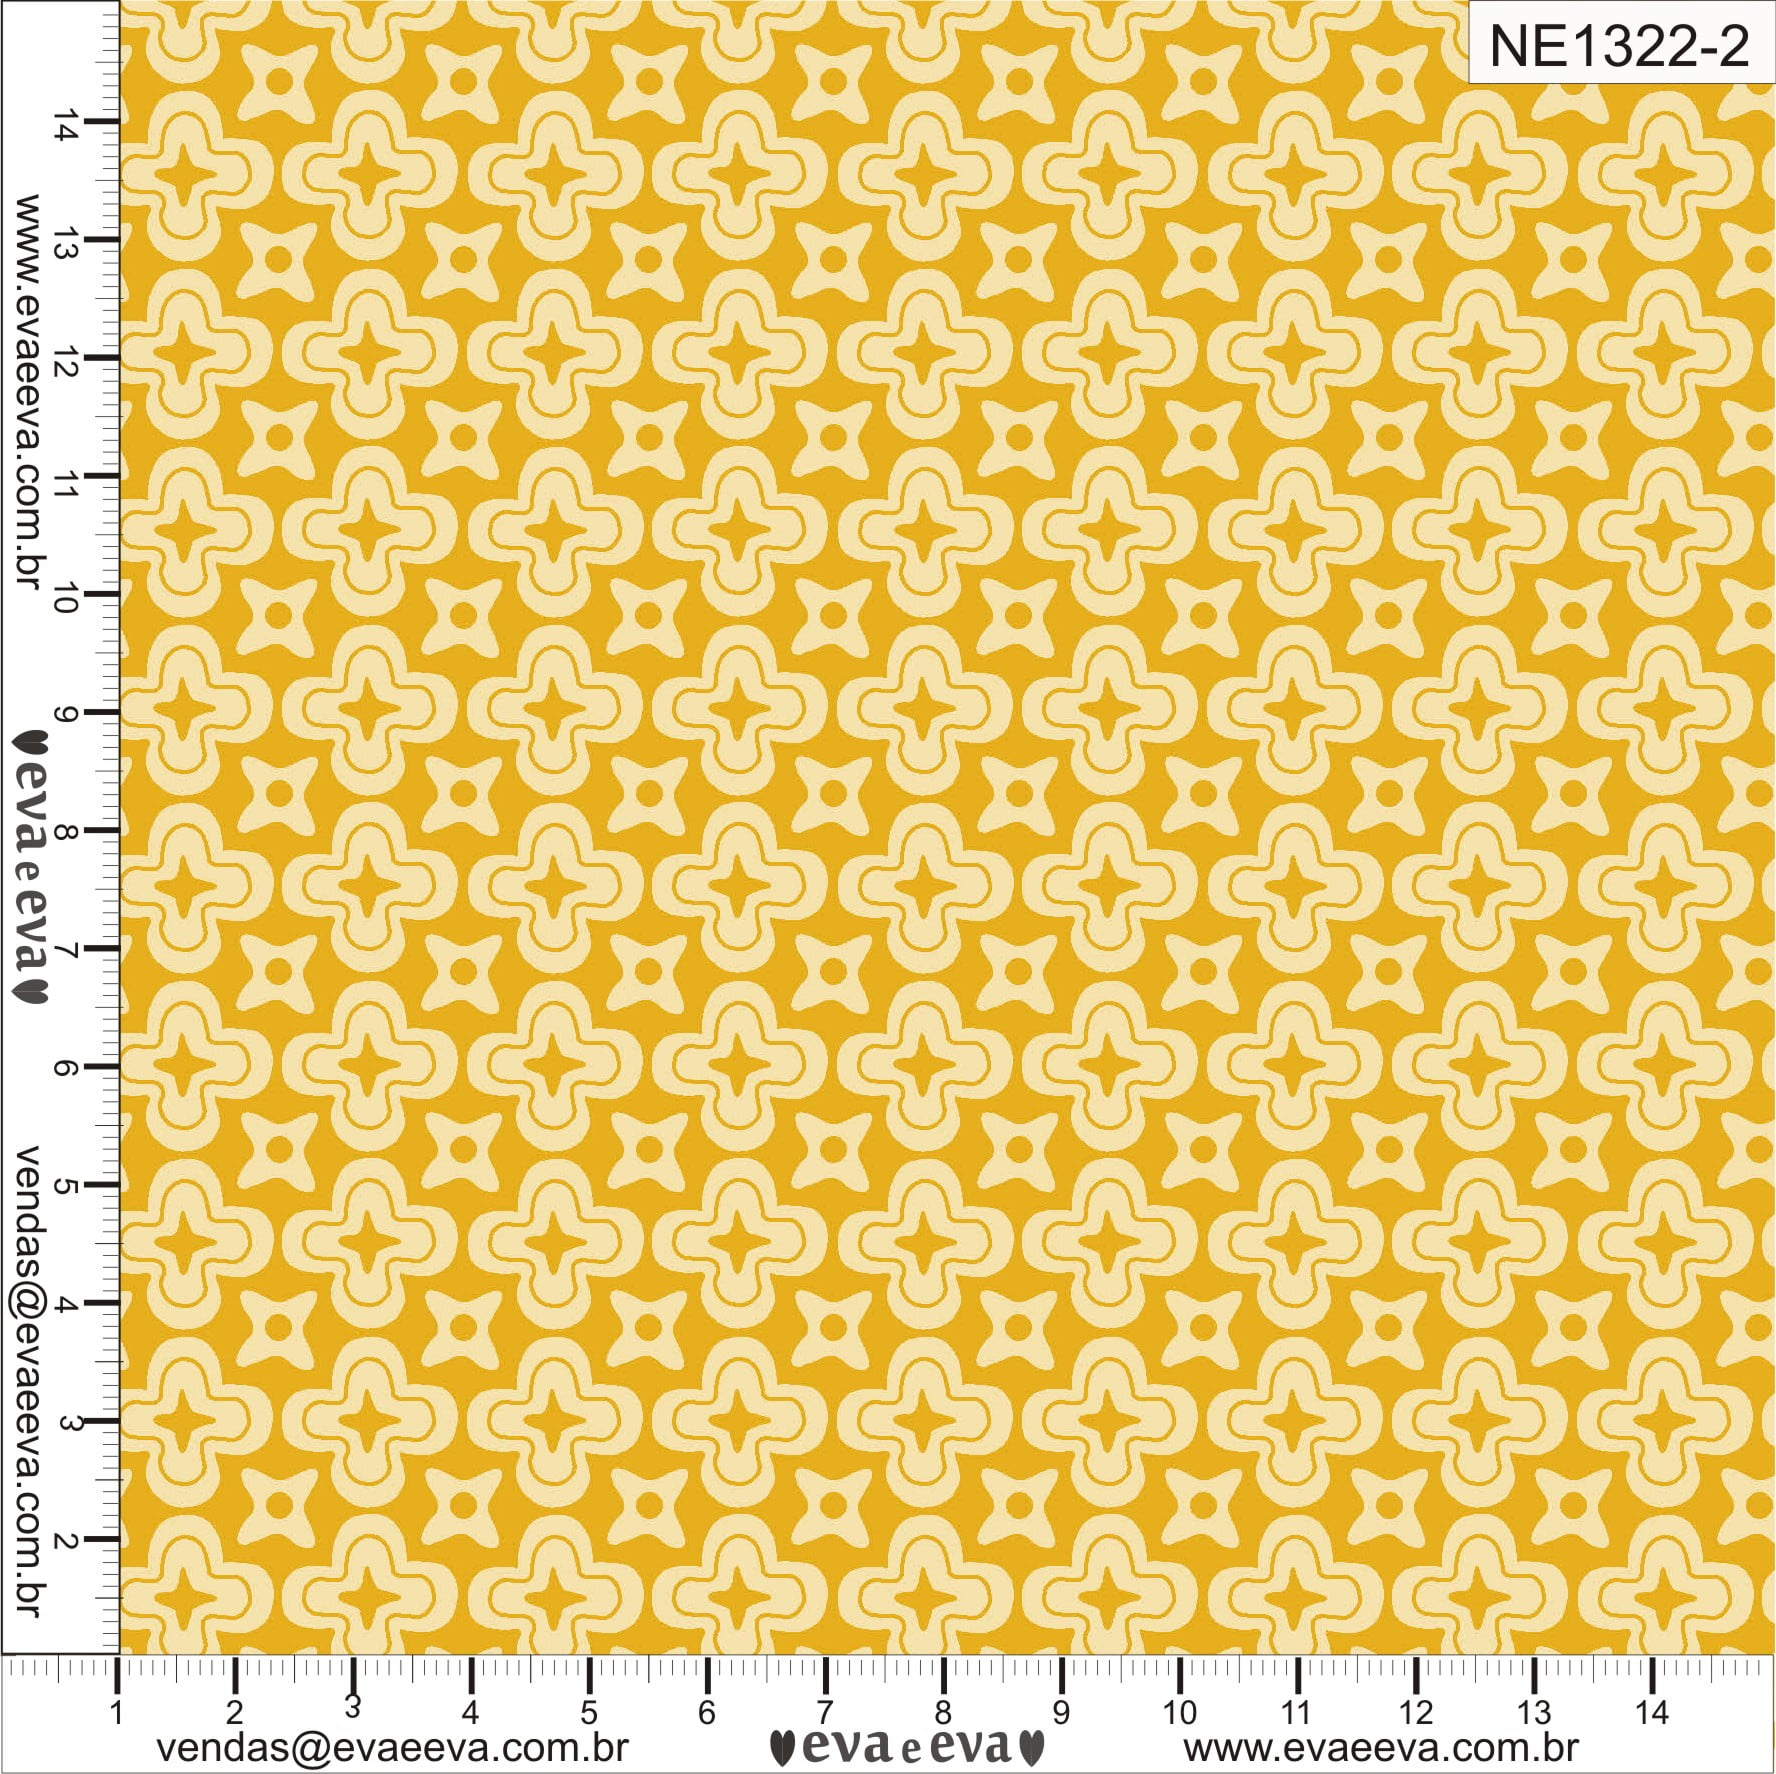 NE1322-2M-TRICOLINE IPANEMA 100% ALGODAO ESTAMPADO